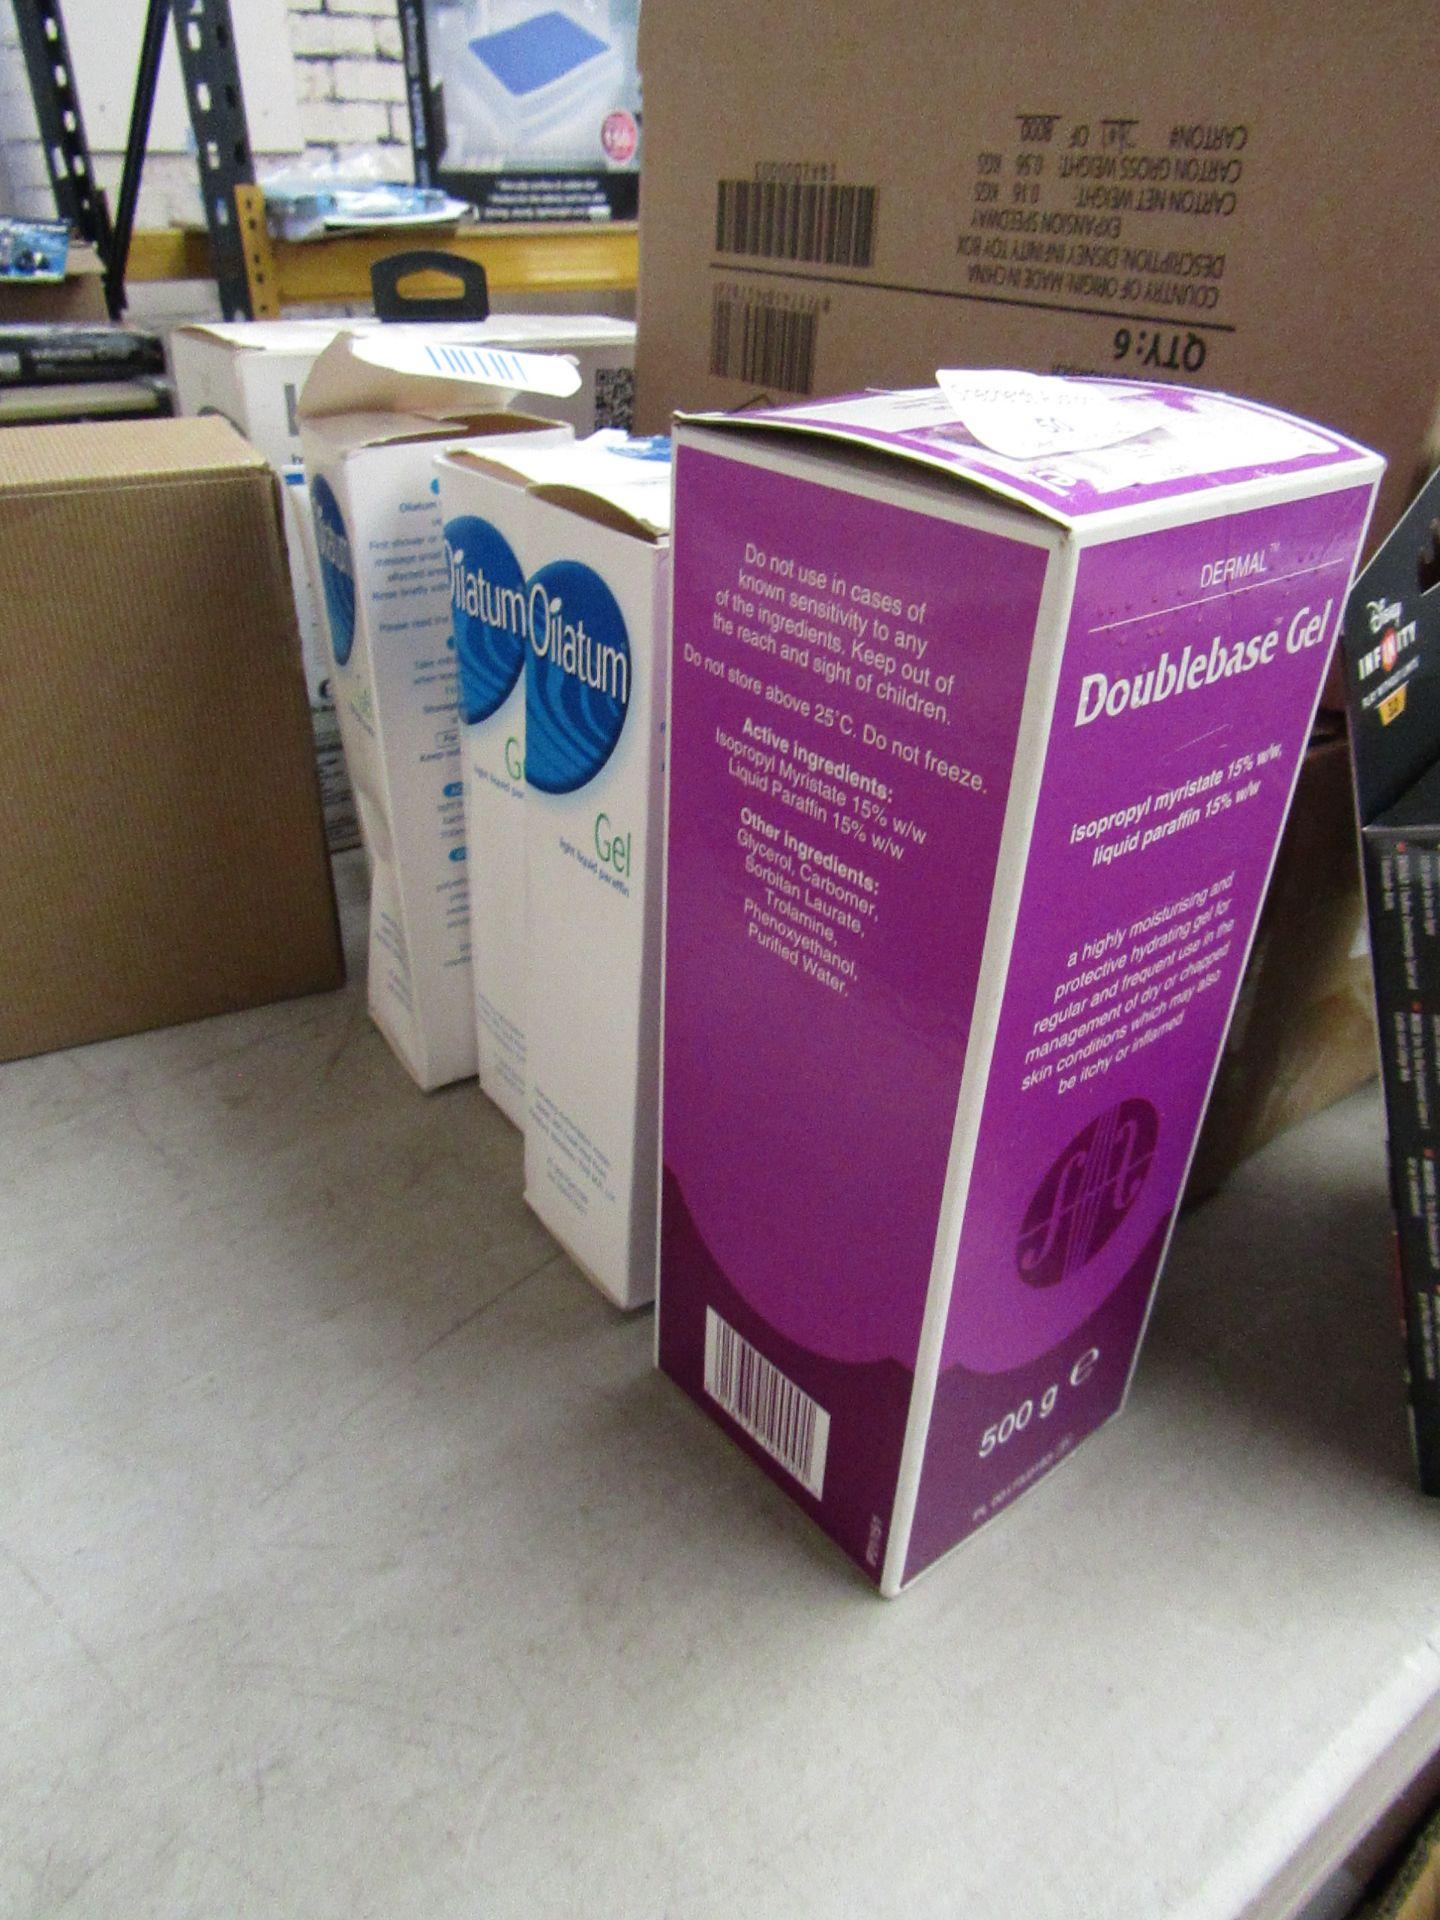 Lot 50 - 4x Items being; 3x 150g Oilatum light liquid paraffin gel with a 500g Dermal double base gel,